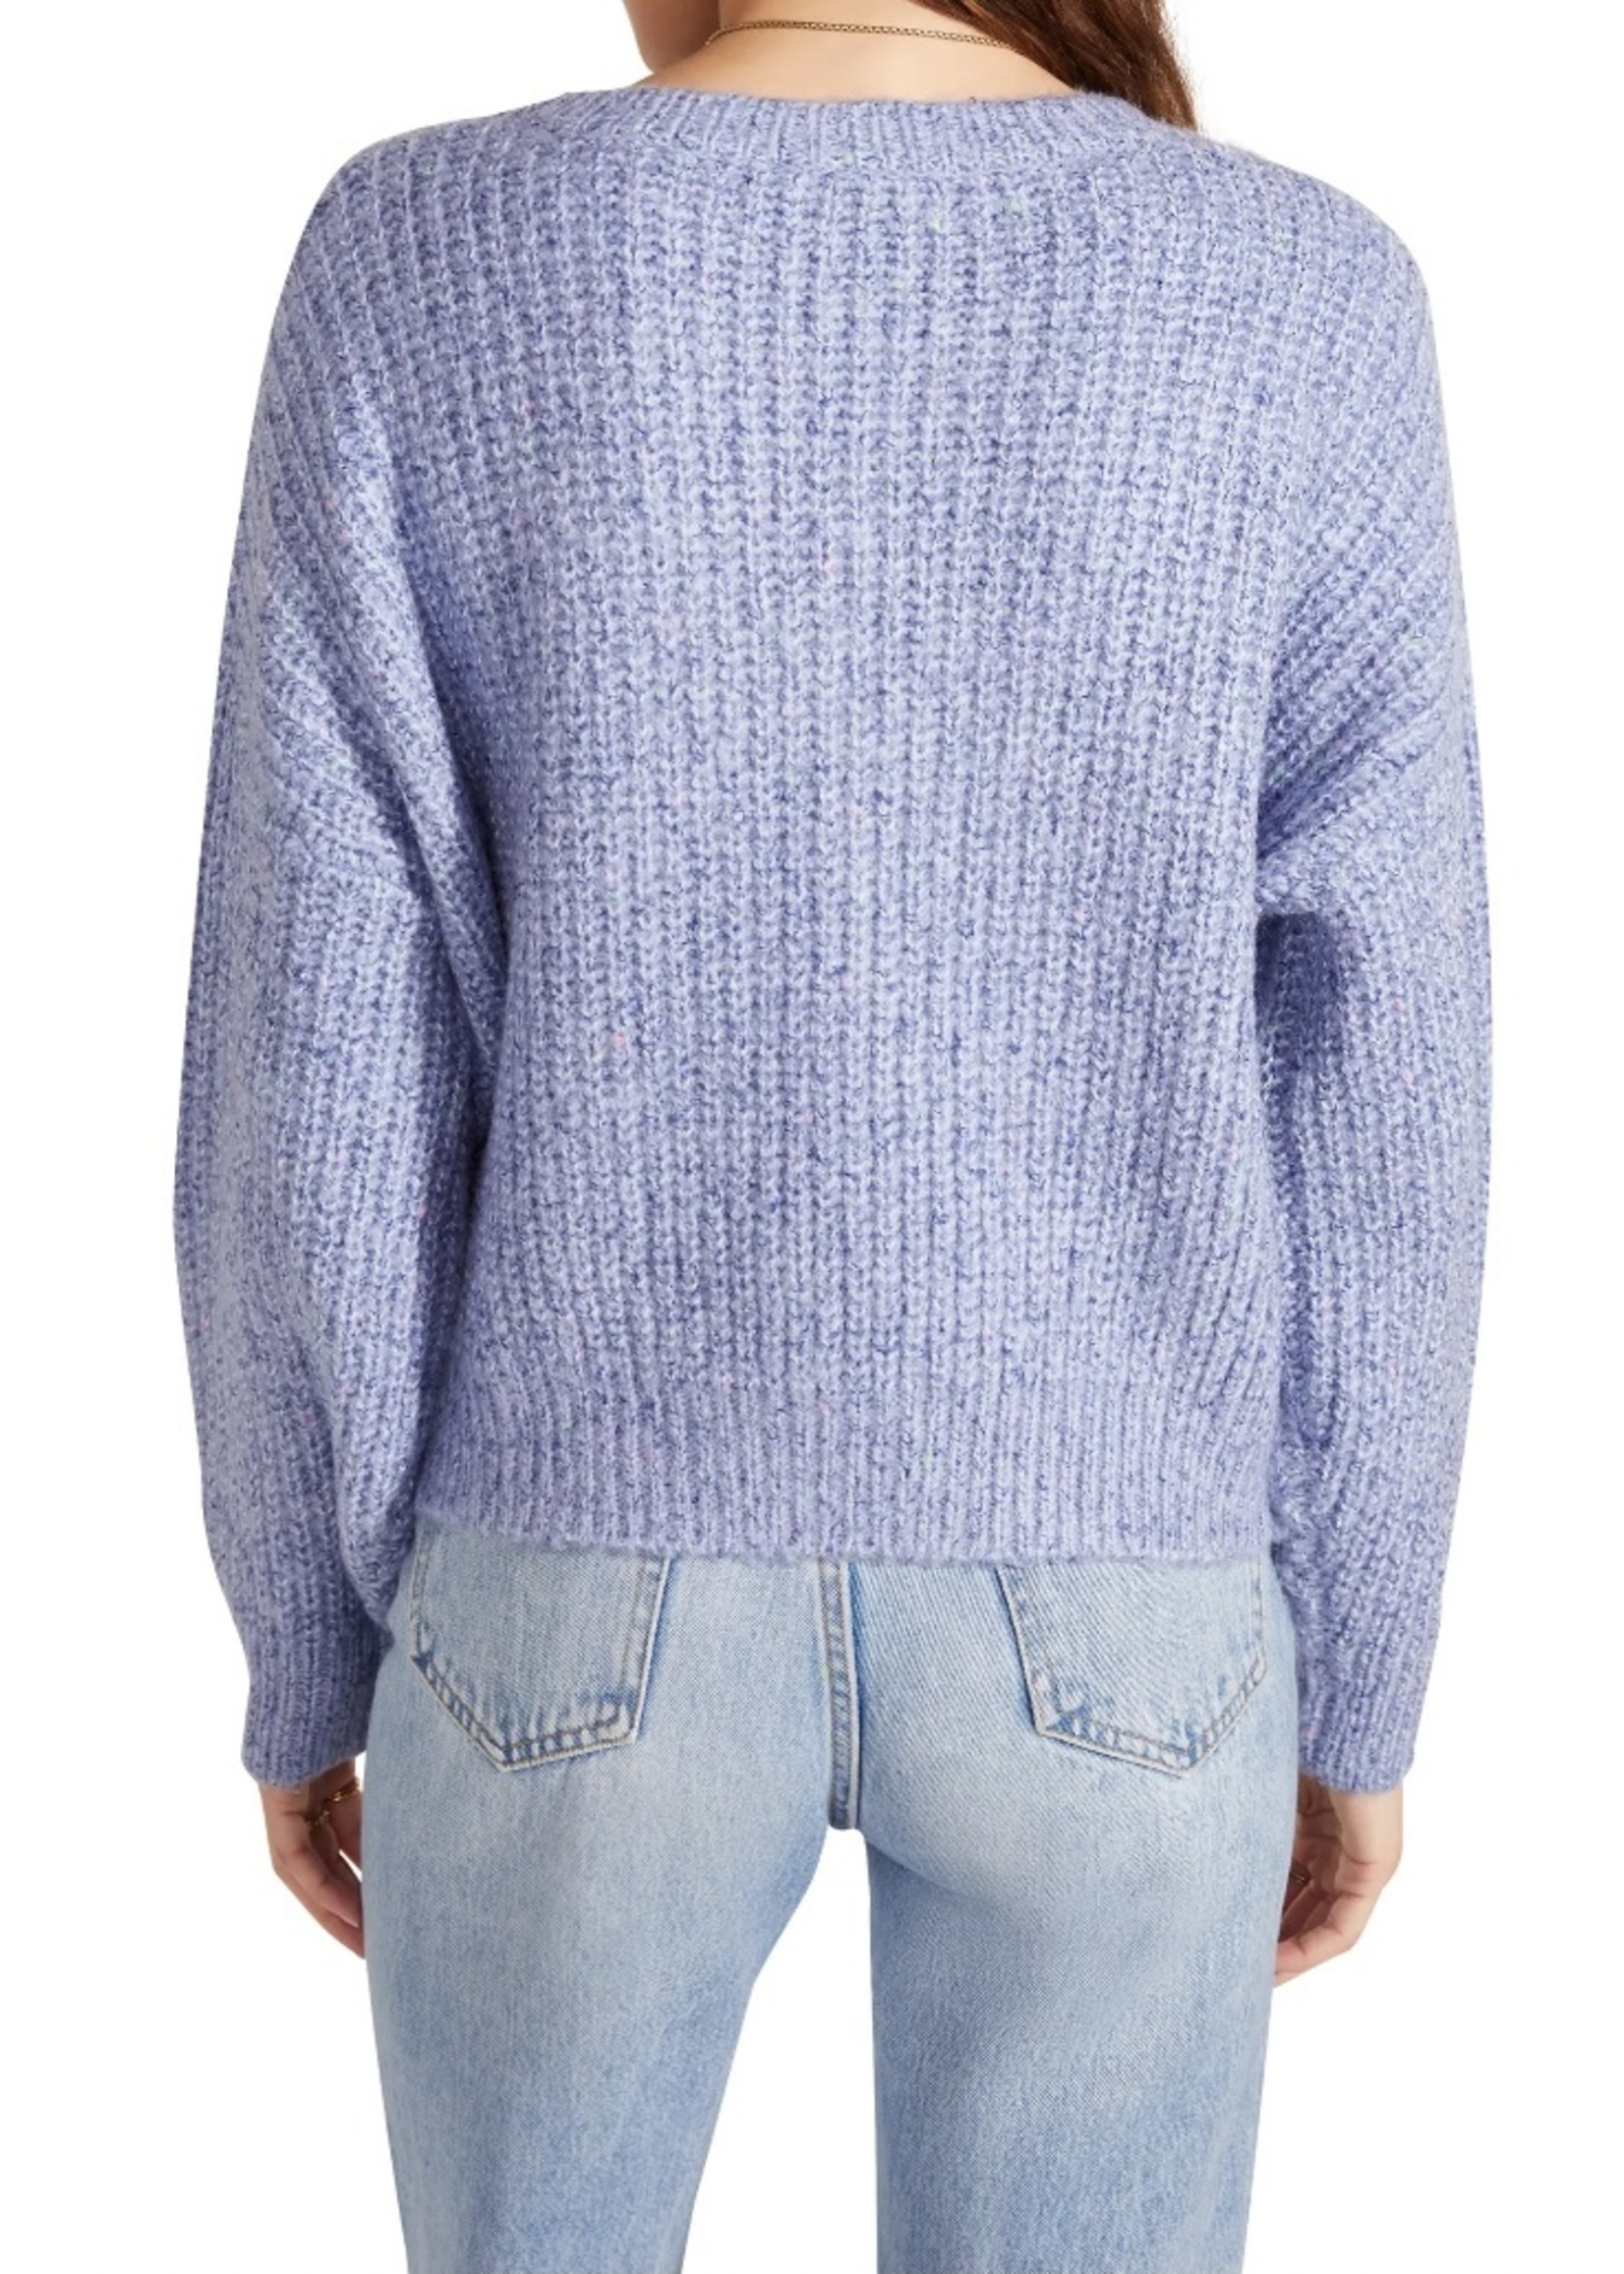 BB Dakota Mixed Business Sweater - BL306020